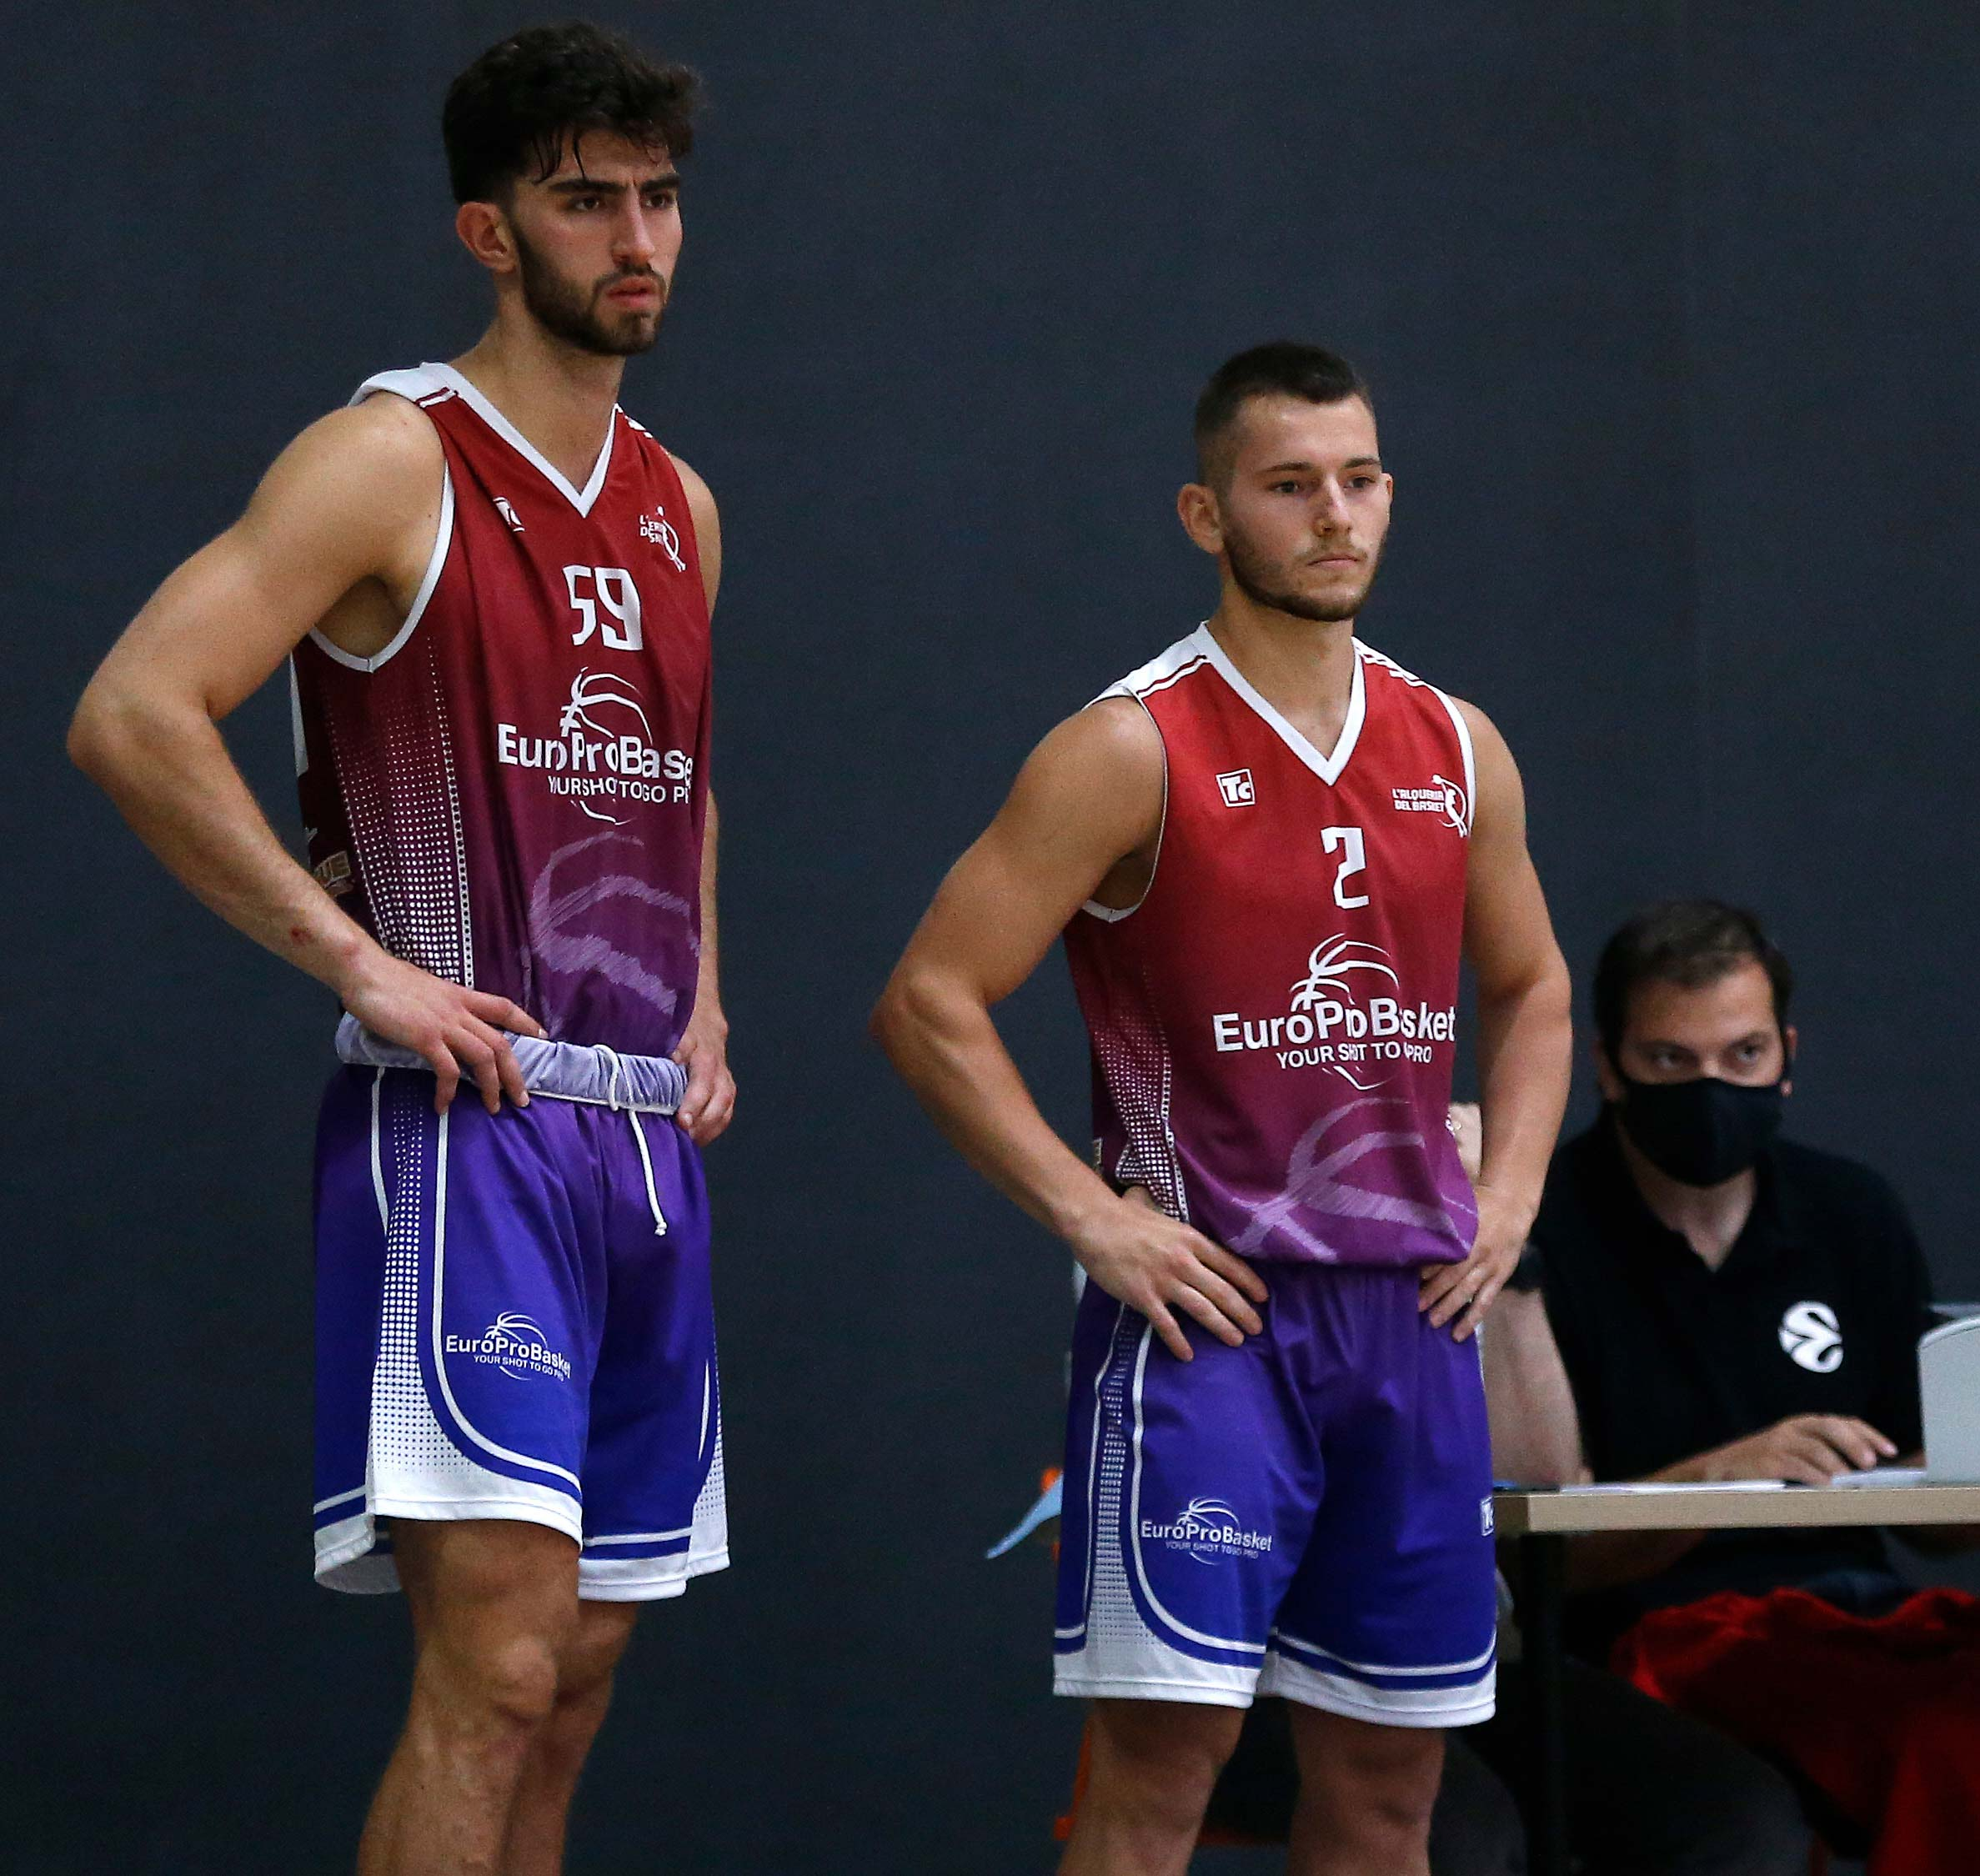 Erkam Kiris and Svetlin